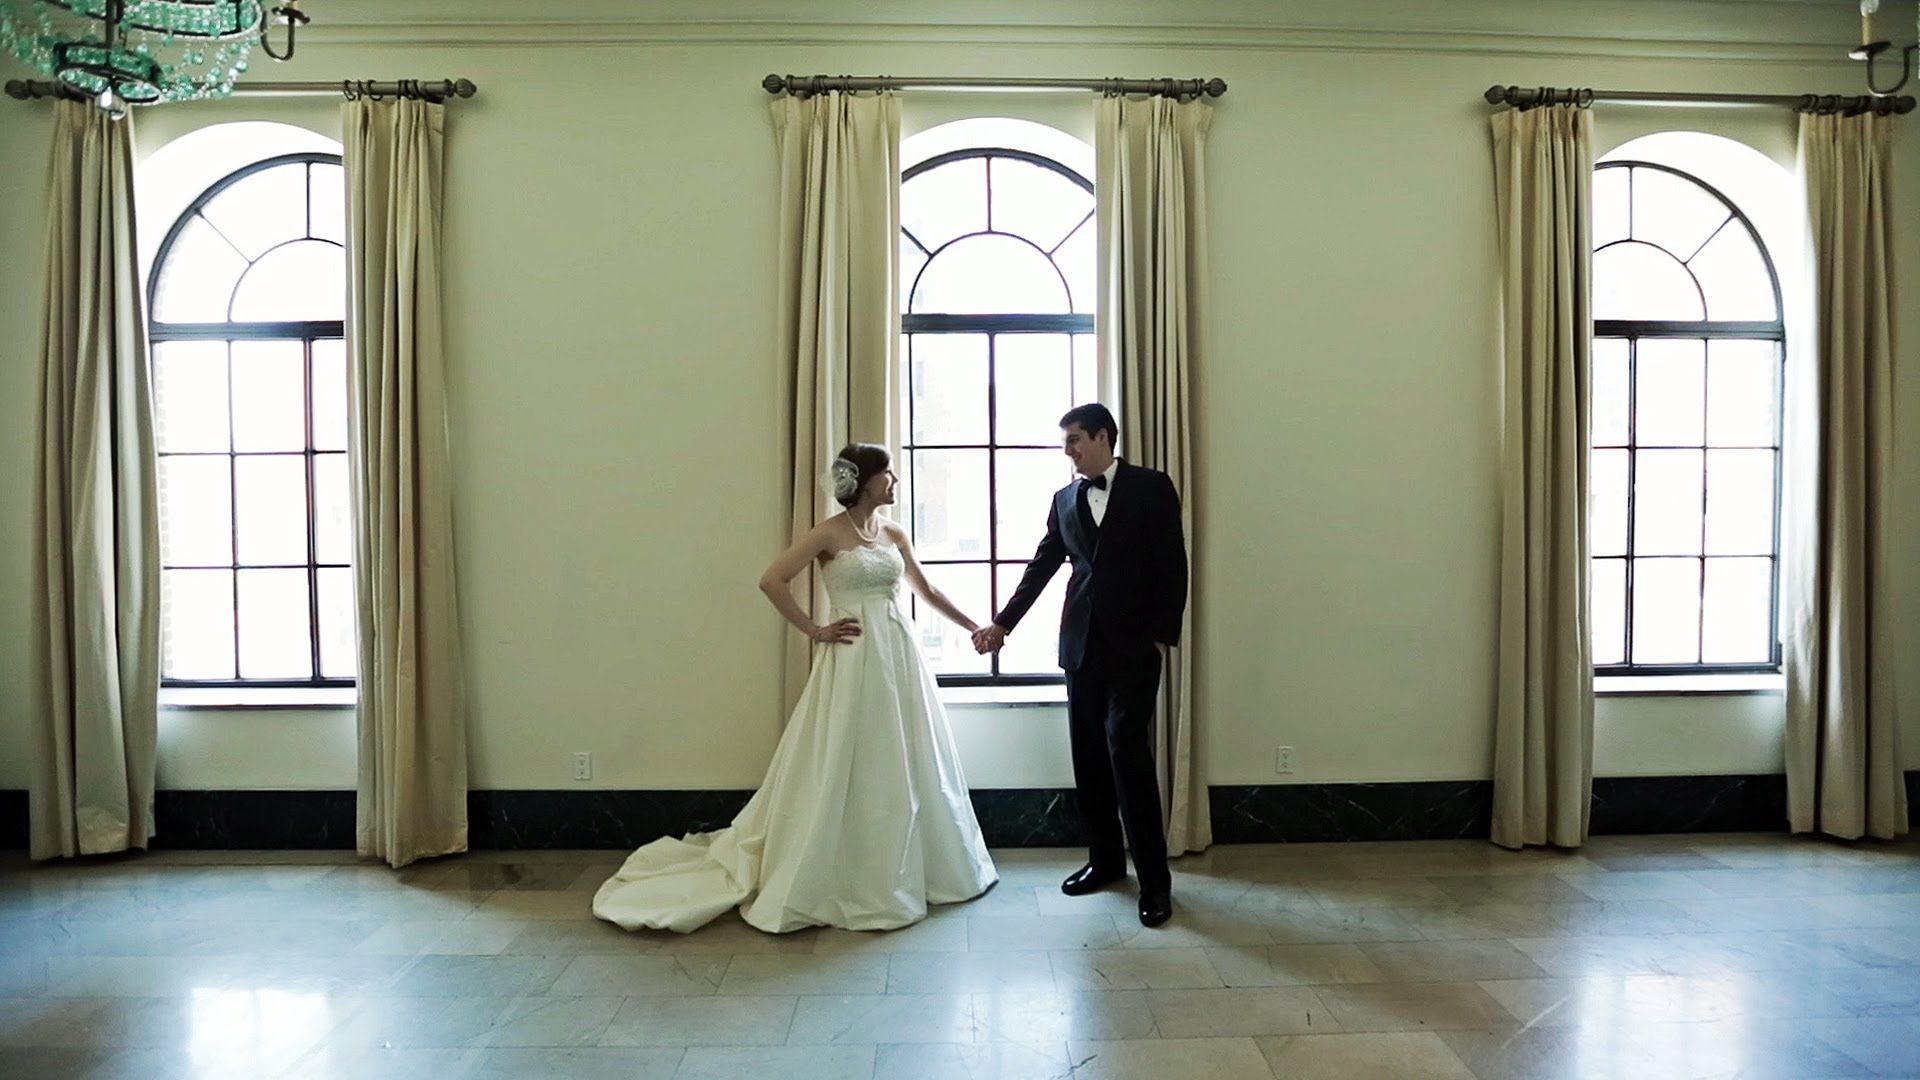 Wedding Film School.Dedolight Dh4 Reception Lighting At 3 38 Wedding Video High